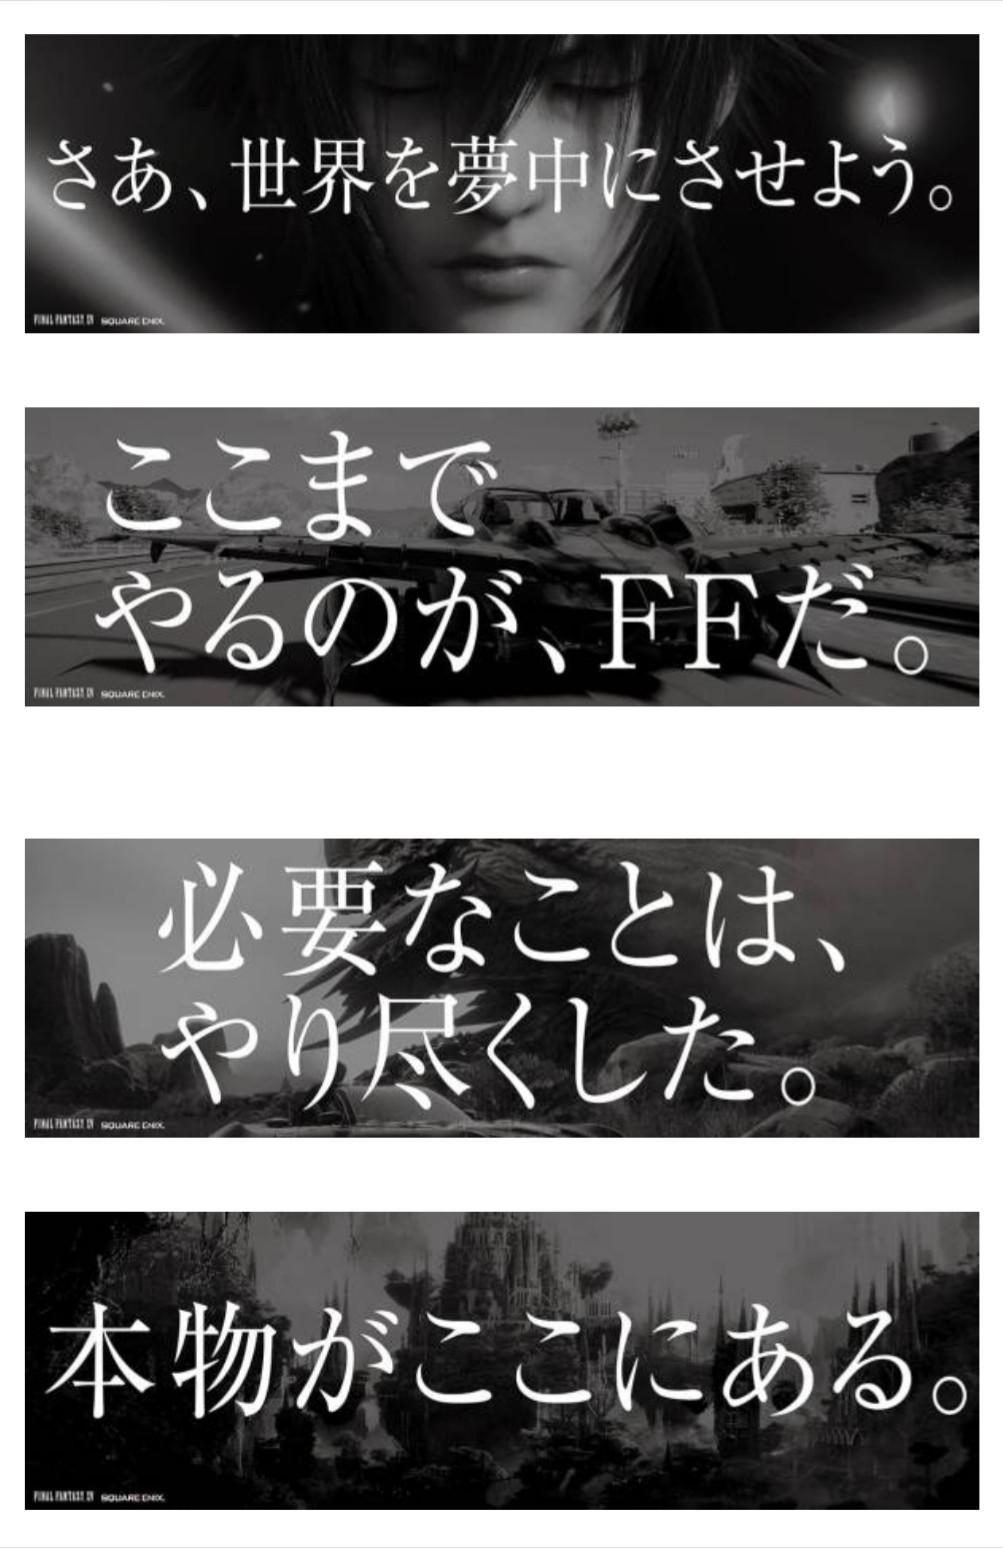 xRnZPgc - 【朗報】小島監督さん、絶賛日本レビューをまとめた画像を公開!